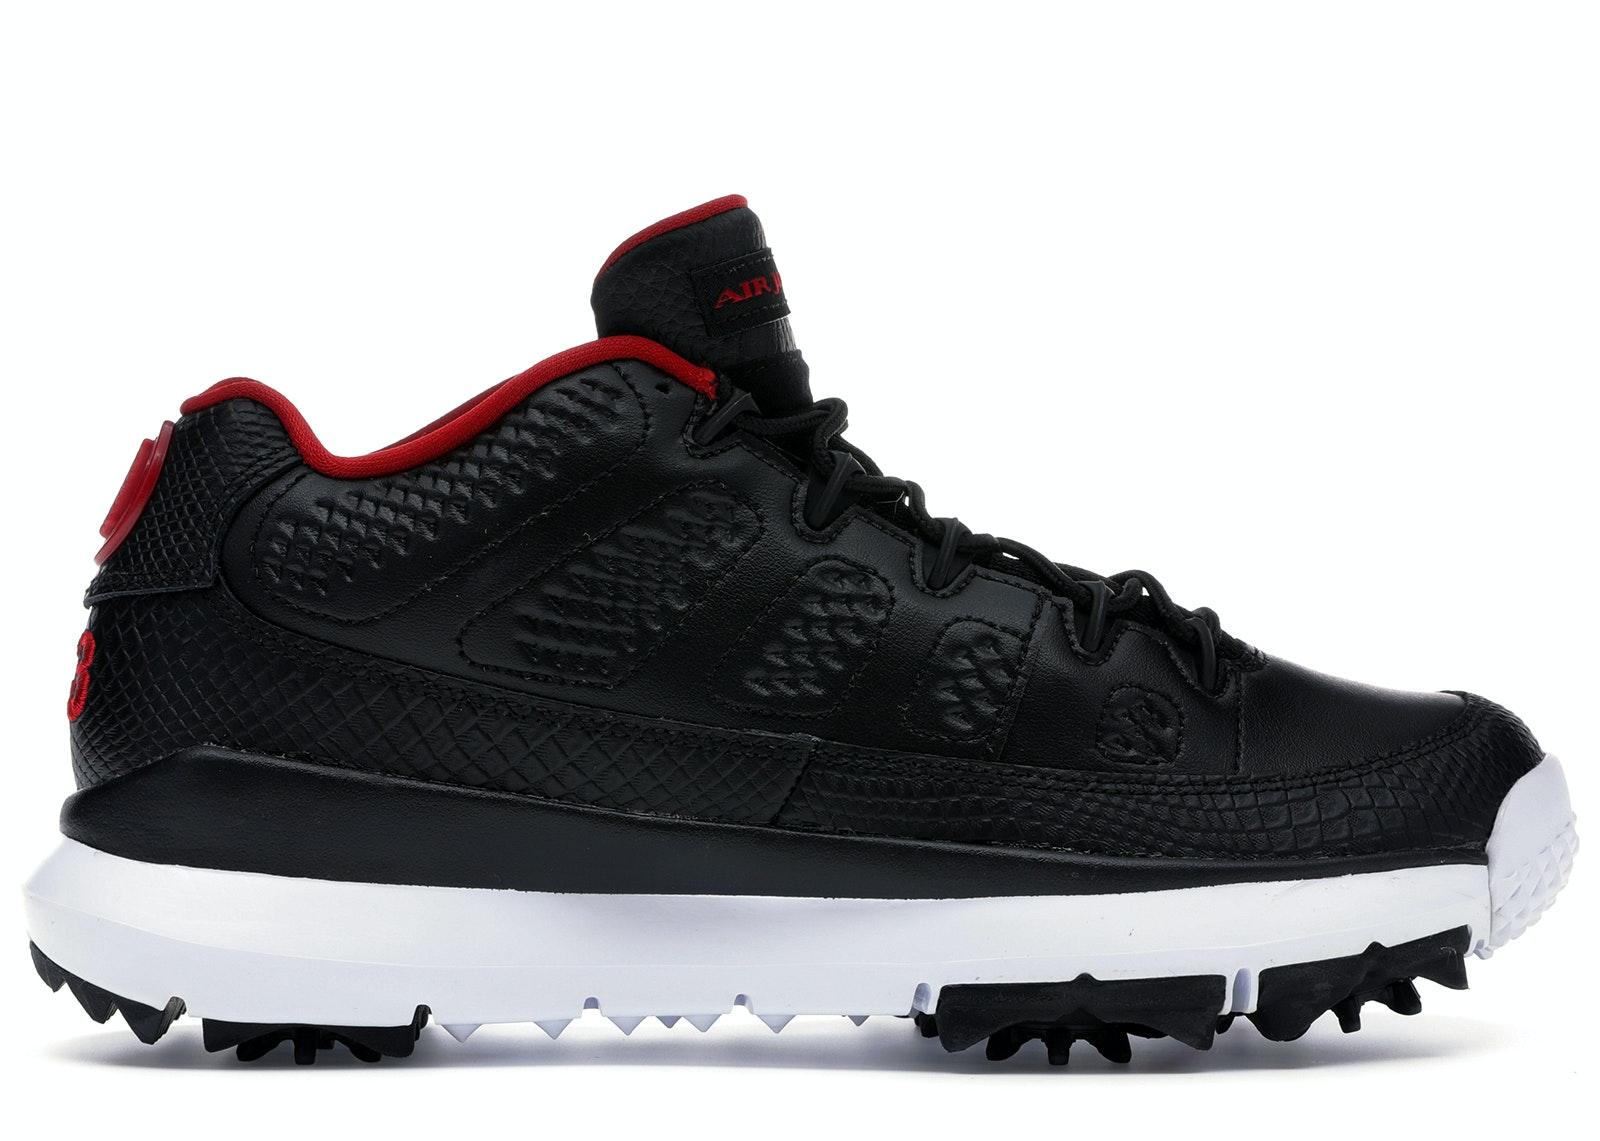 Jordan 9 Retro Golf Cleat Bred